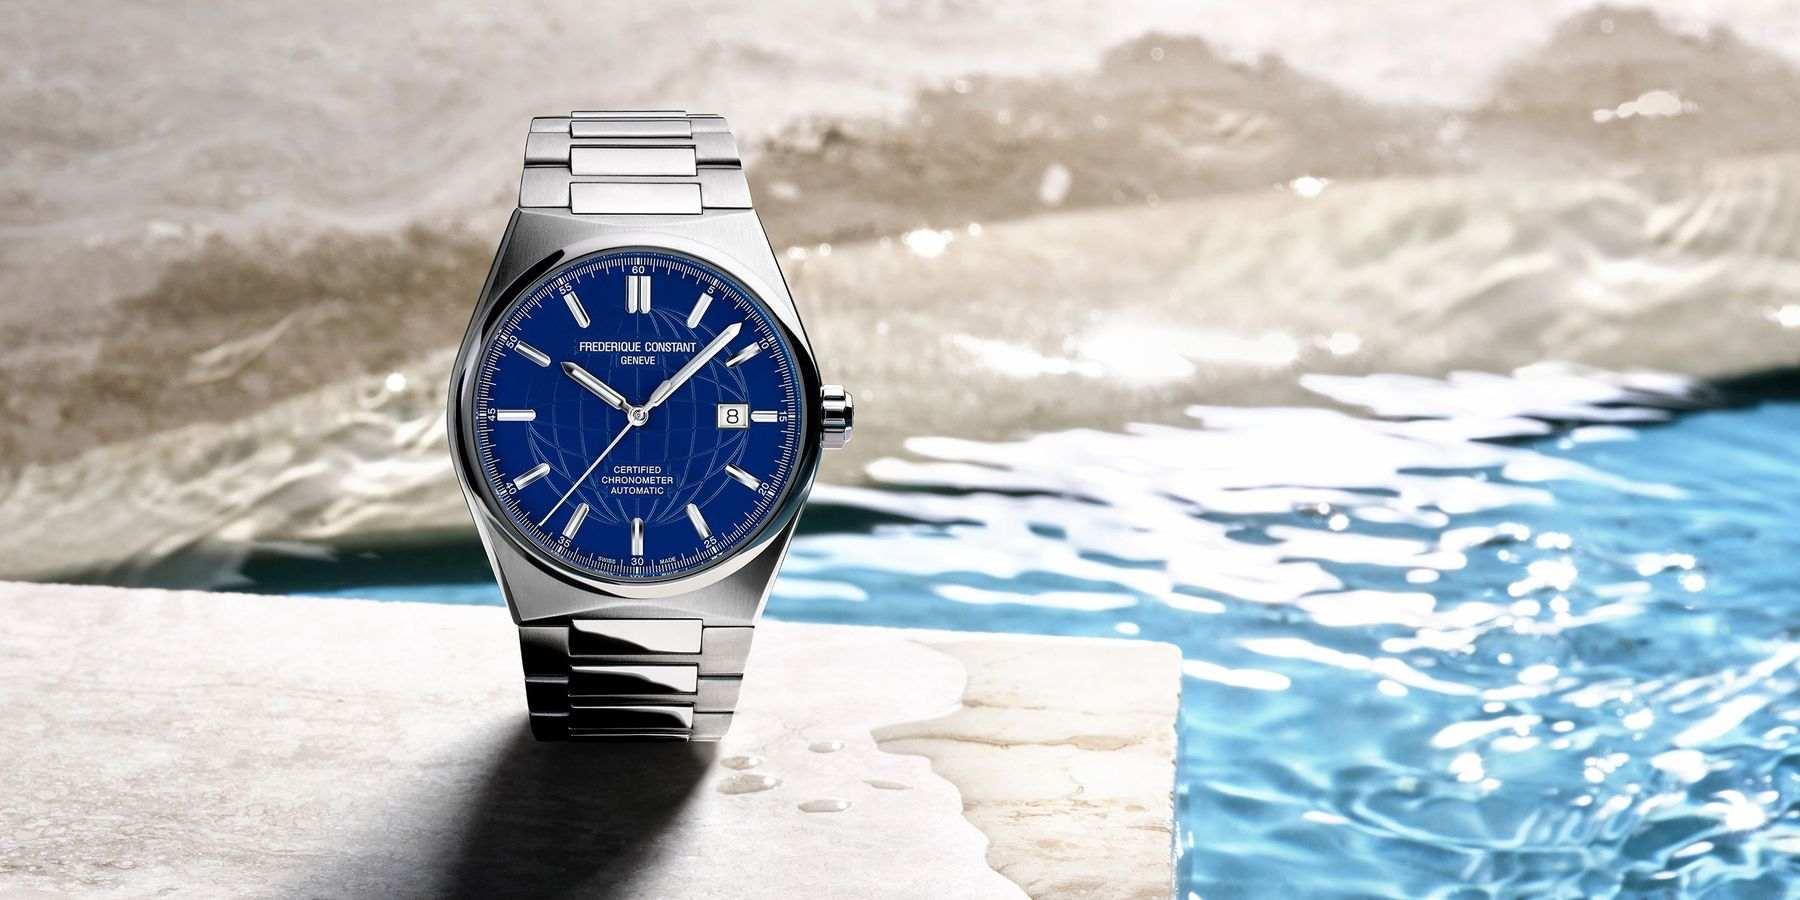 跳脫平凡新選擇:Frederique Constant Highlife系列腕錶